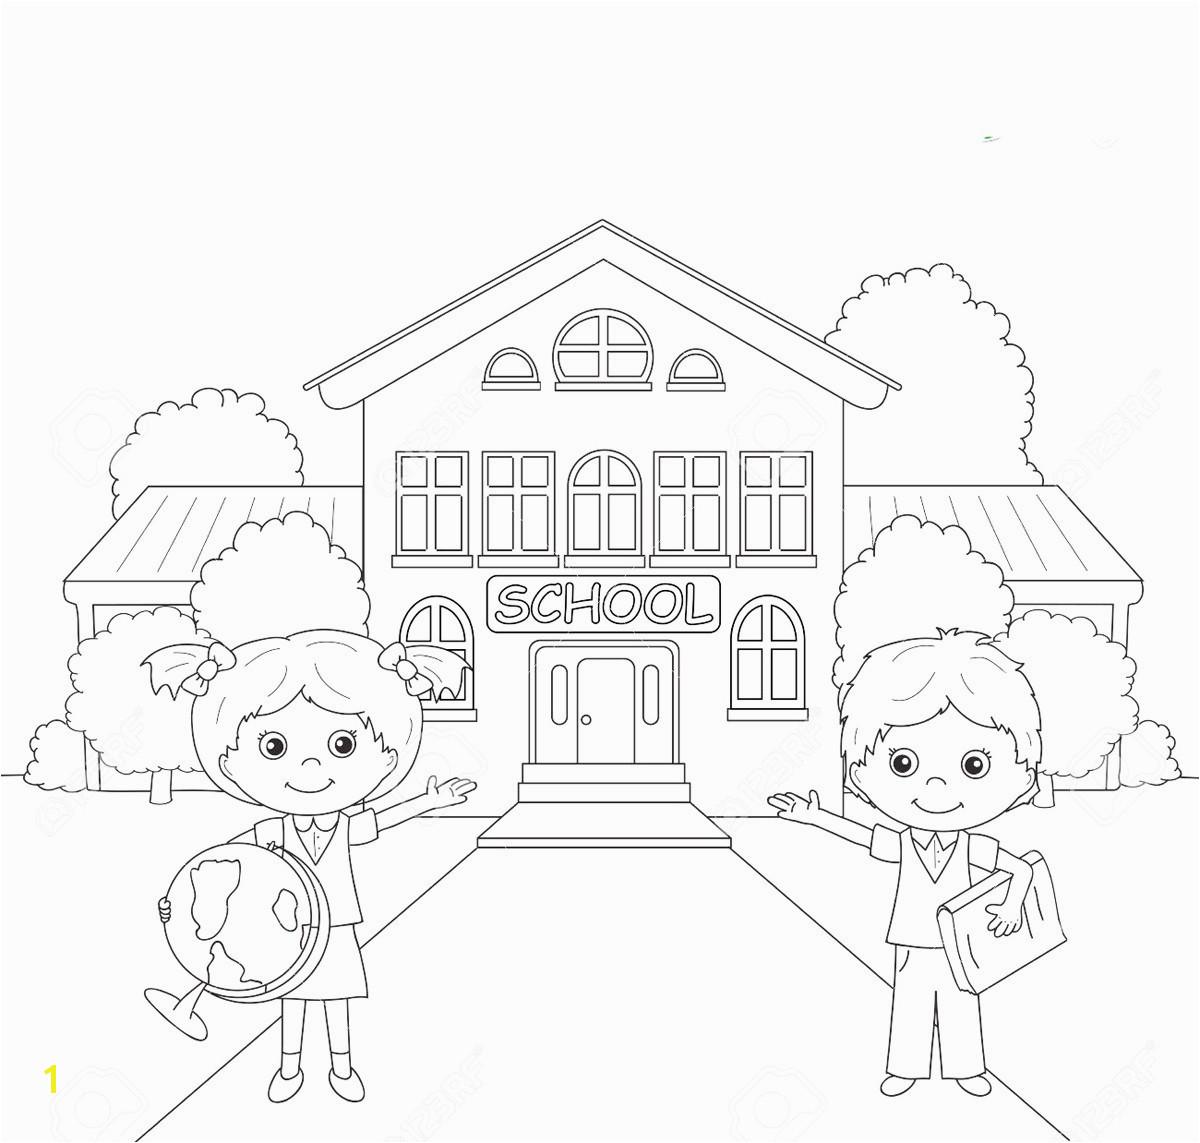 Coloring Pages School Building Elegant School Building Colouring Pages for Kids – Wurzen Coloring